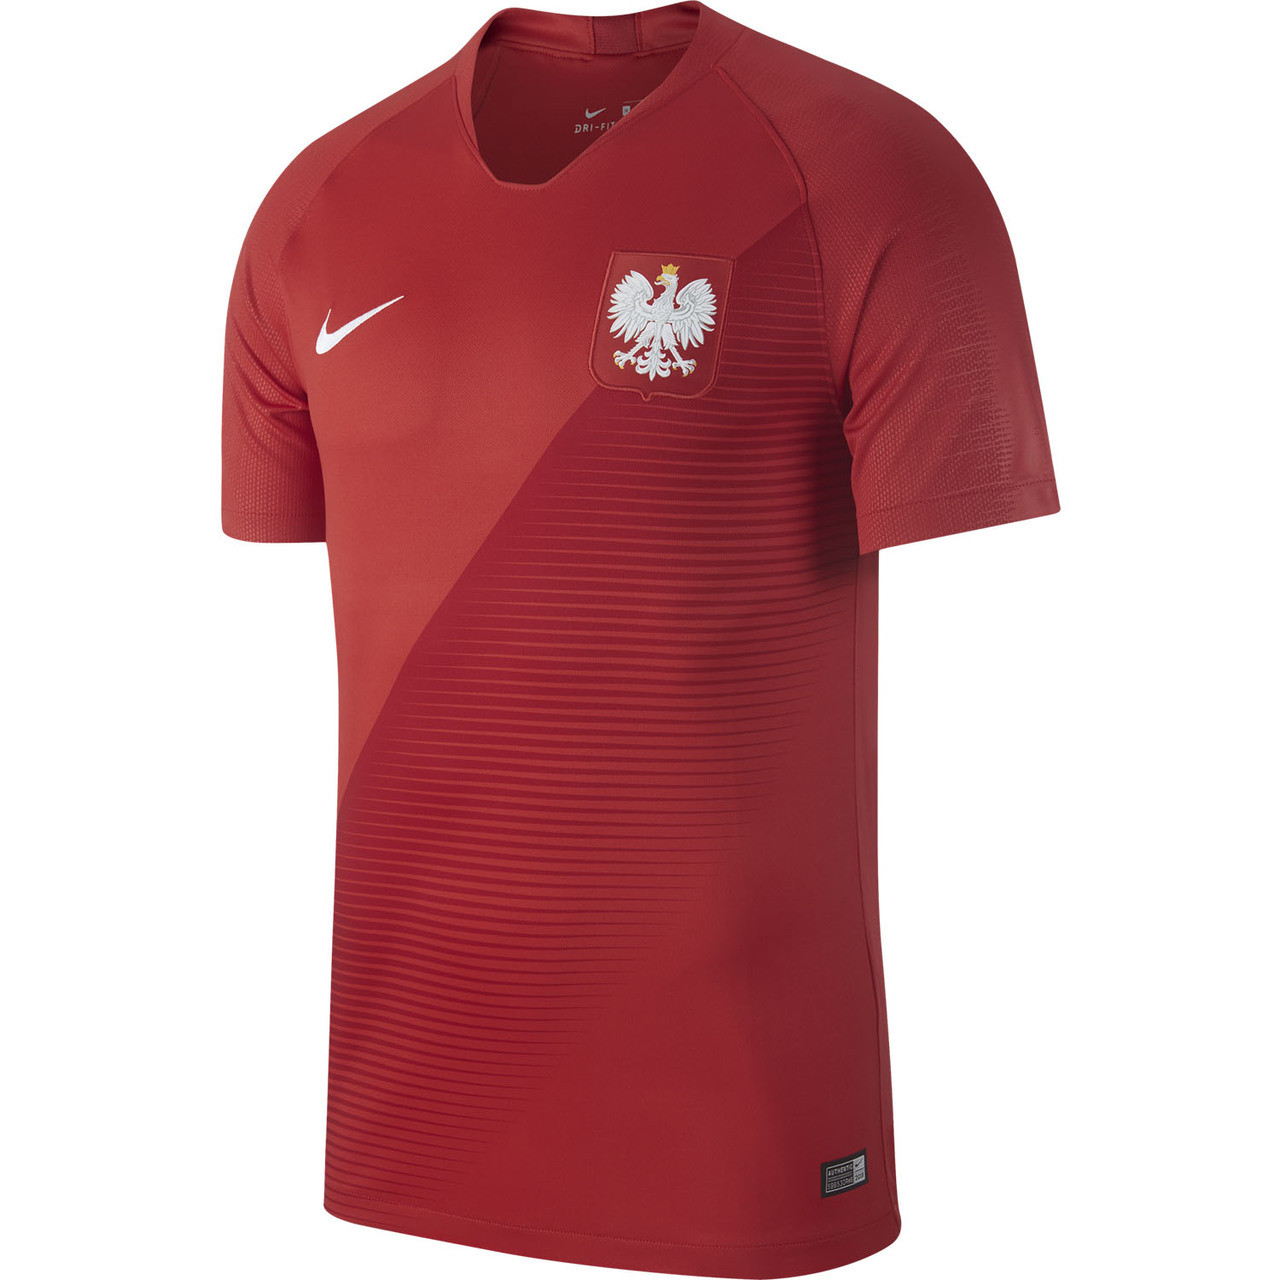 Nike poland away jersey red soccer plus jpg 1280x1280 Poland soccer jacket 71d7a1db2